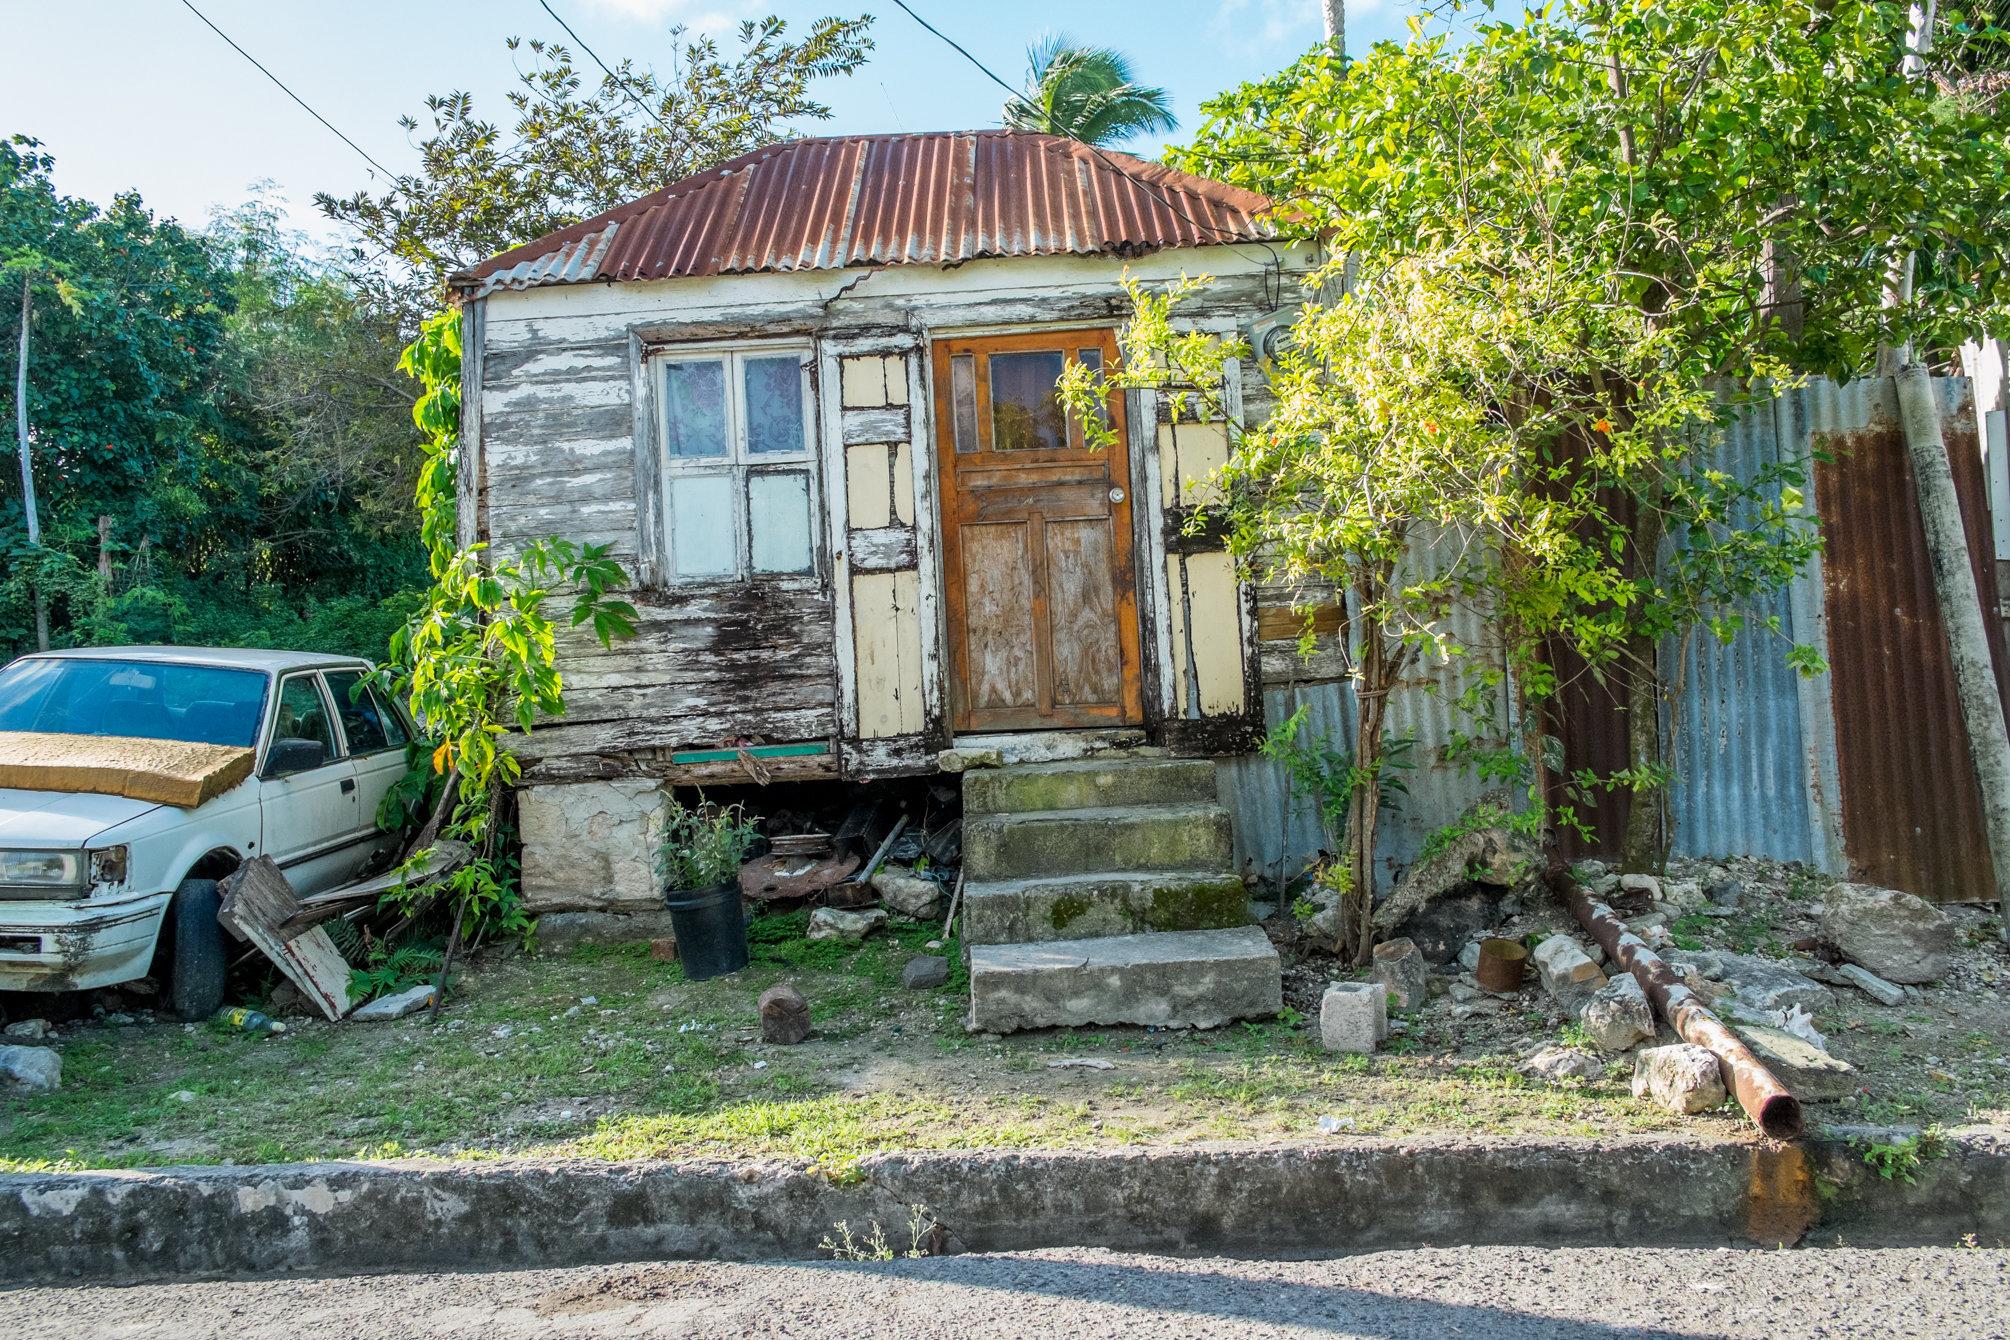 Caribbean, impressions-4843.jpg